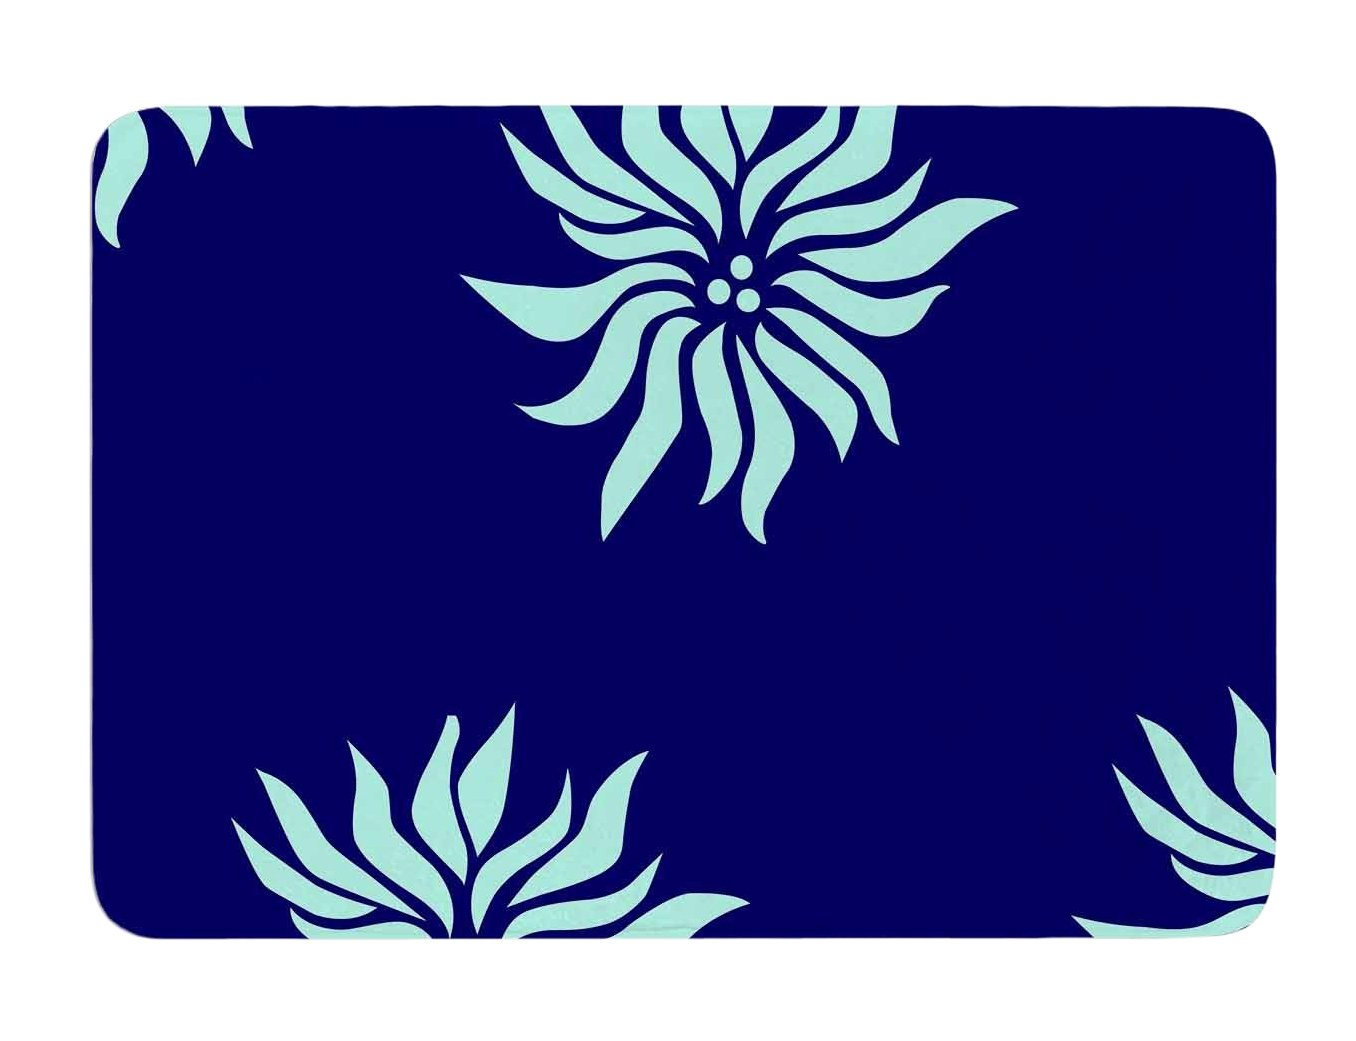 Kess InHouse NL Designs Snow Flowers Blue Aqua Memory Foam Bath Mat, 17 by 24-Inch, 17' X 24'